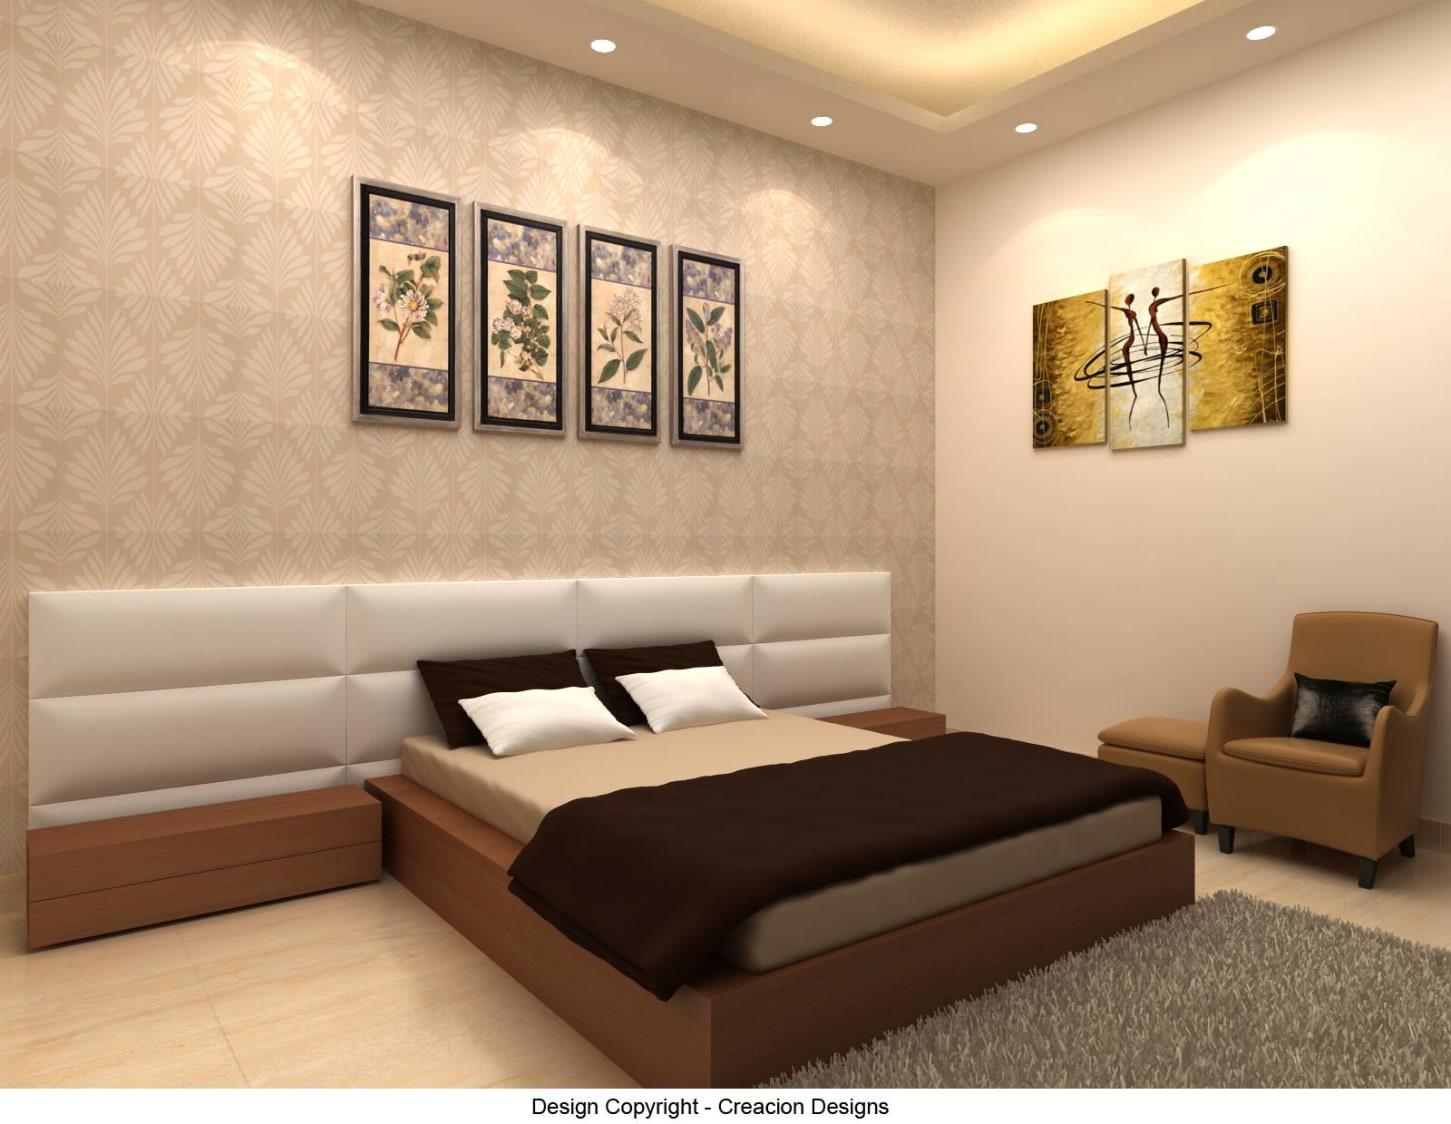 Bedroom With Modern Touch by Deepanshu Prasad Bedroom Modern | Interior Design Photos & Ideas